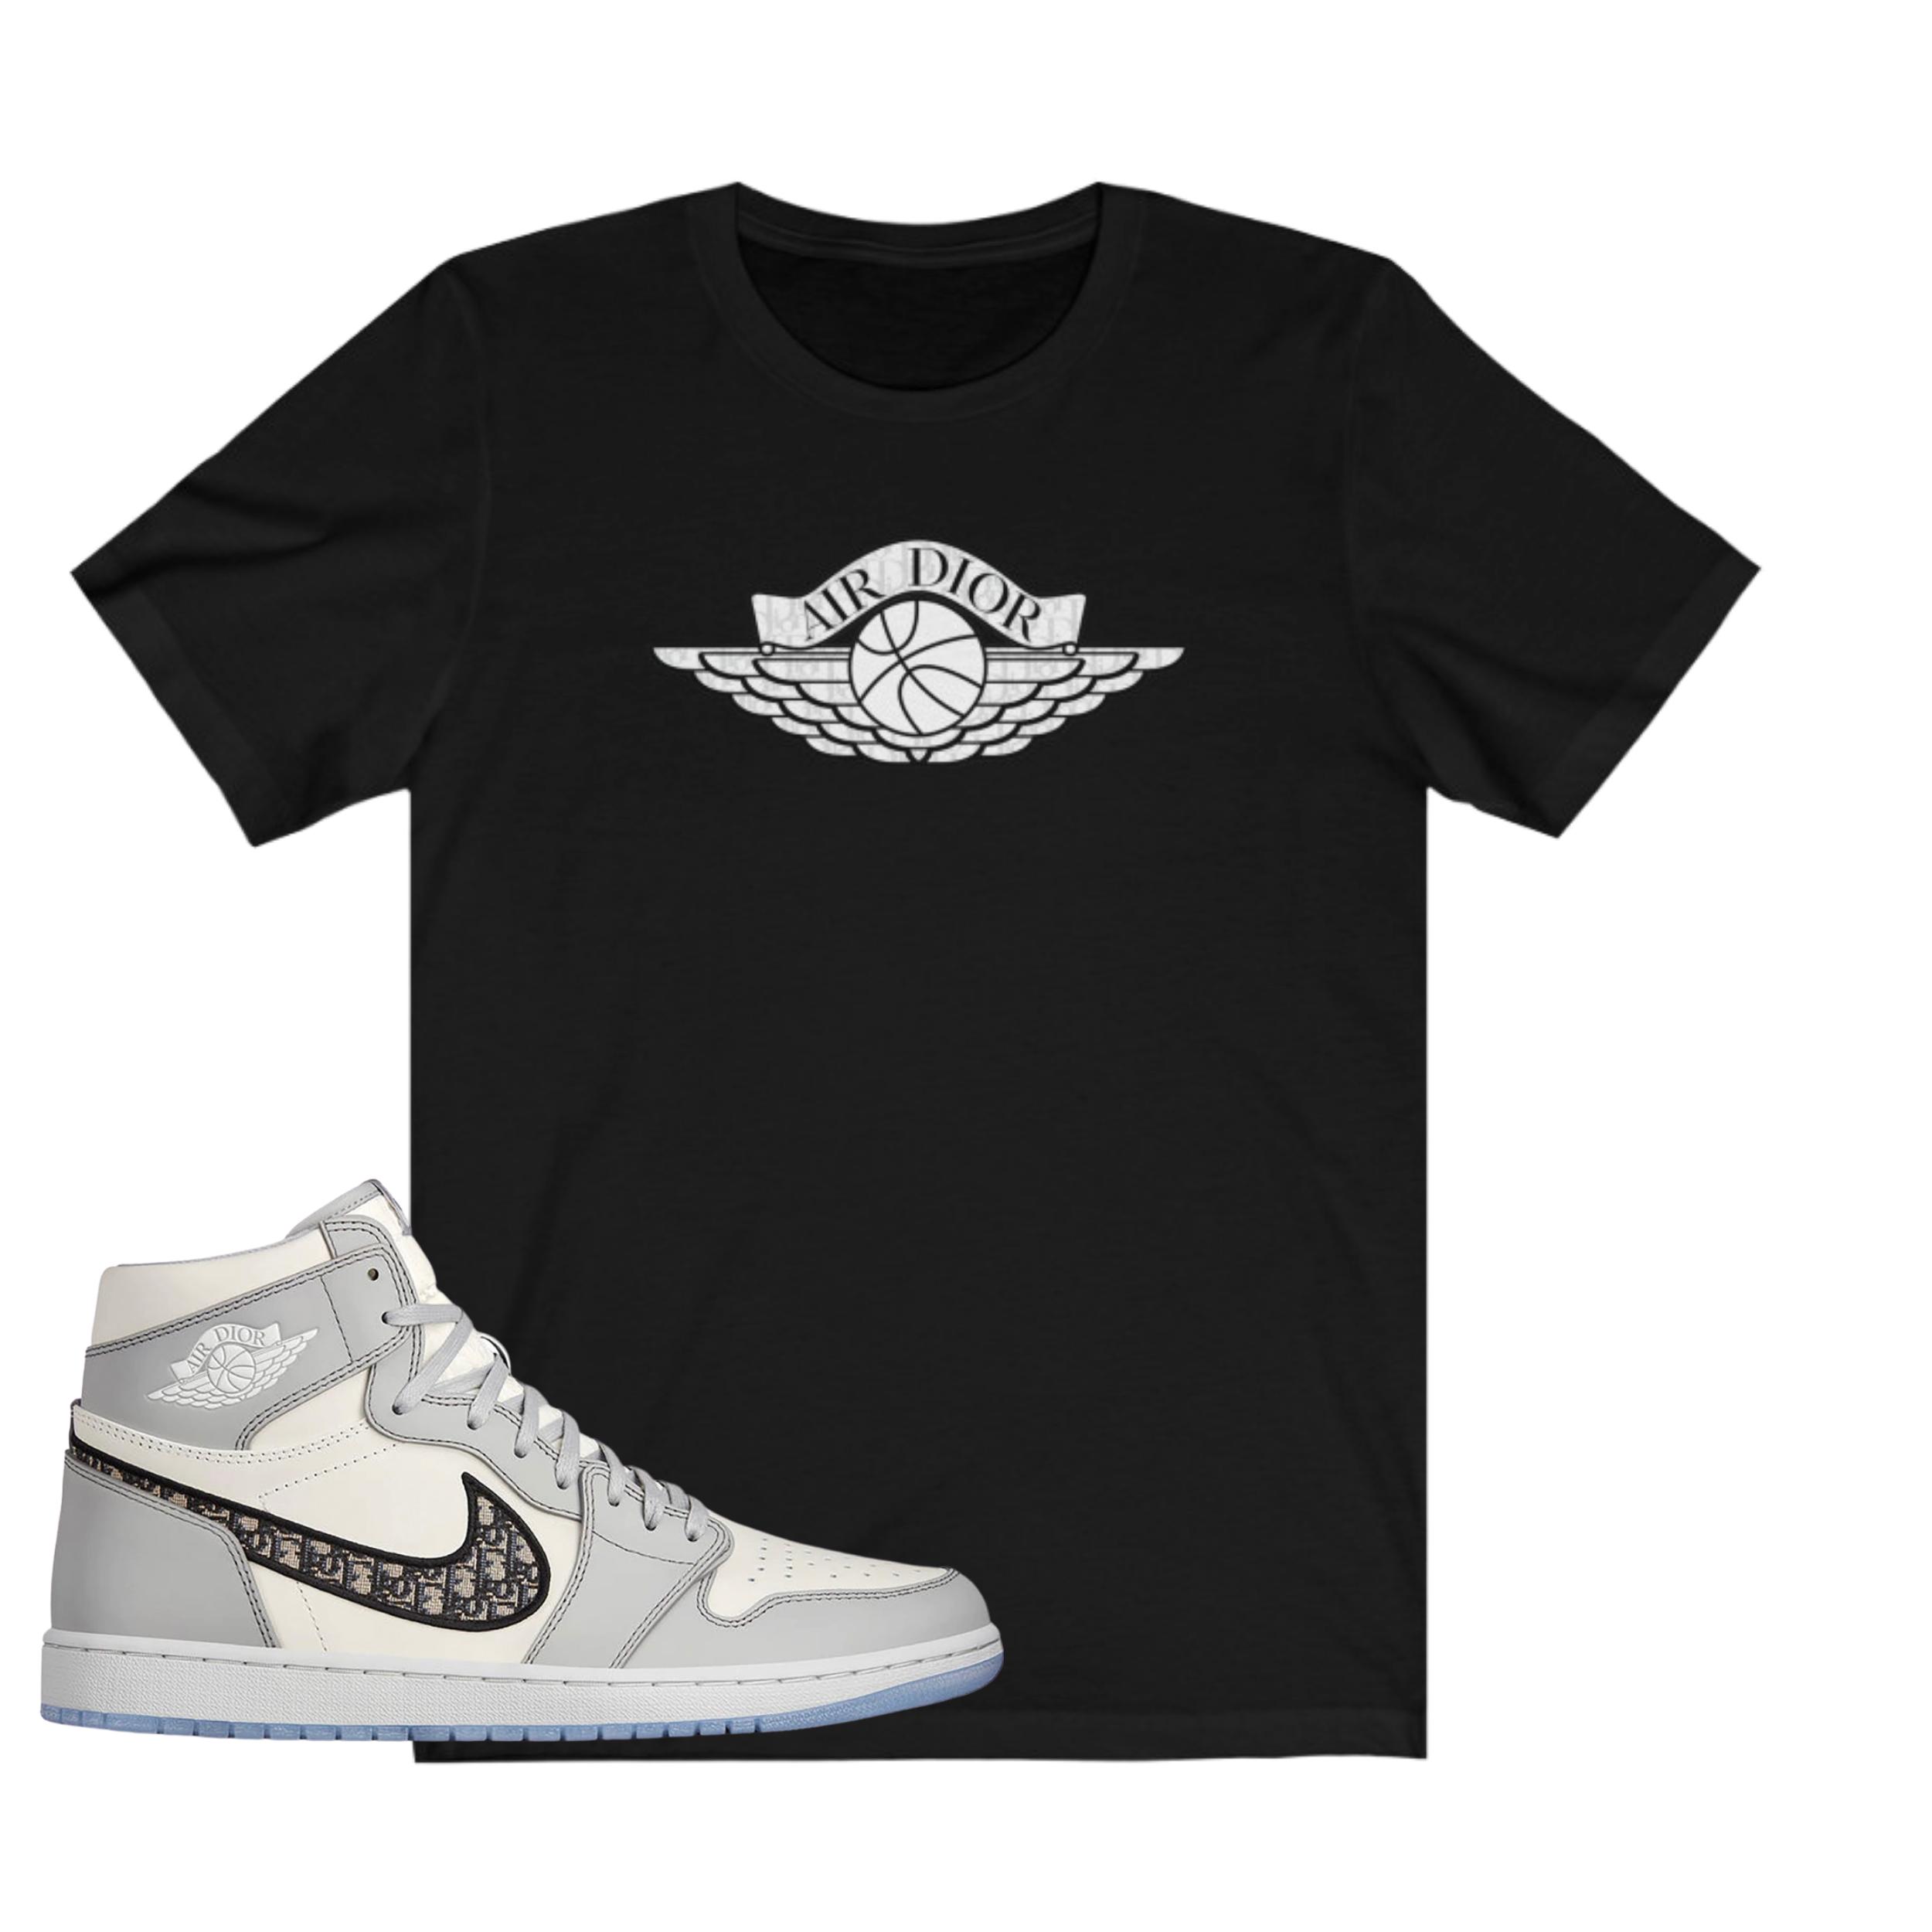 Jordan Air Dior Matching Shirts By Kim Jones Sneakers Match Tee Sneaker Match Tees Sneaker Match Jordan Shirts